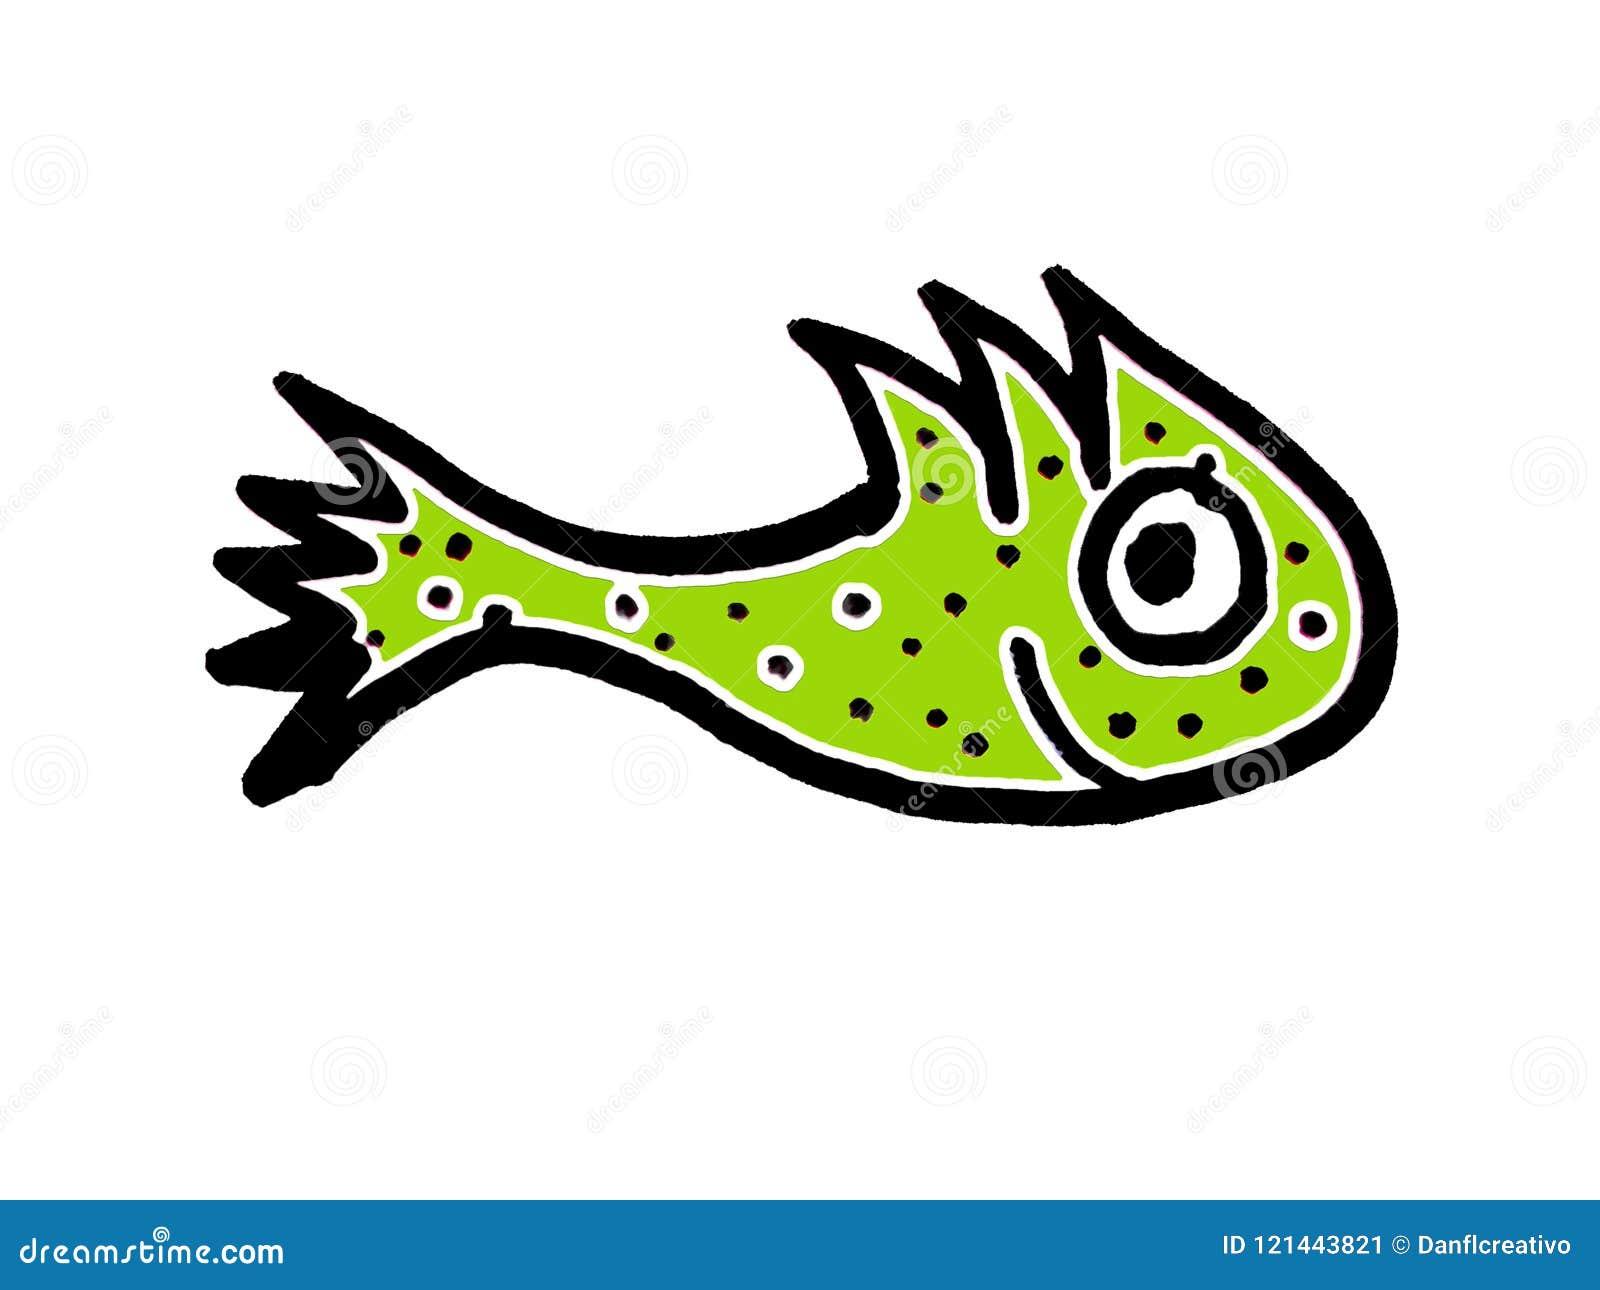 Cute Fish Cartoon Kids Style Drawing Stock Illustration ...